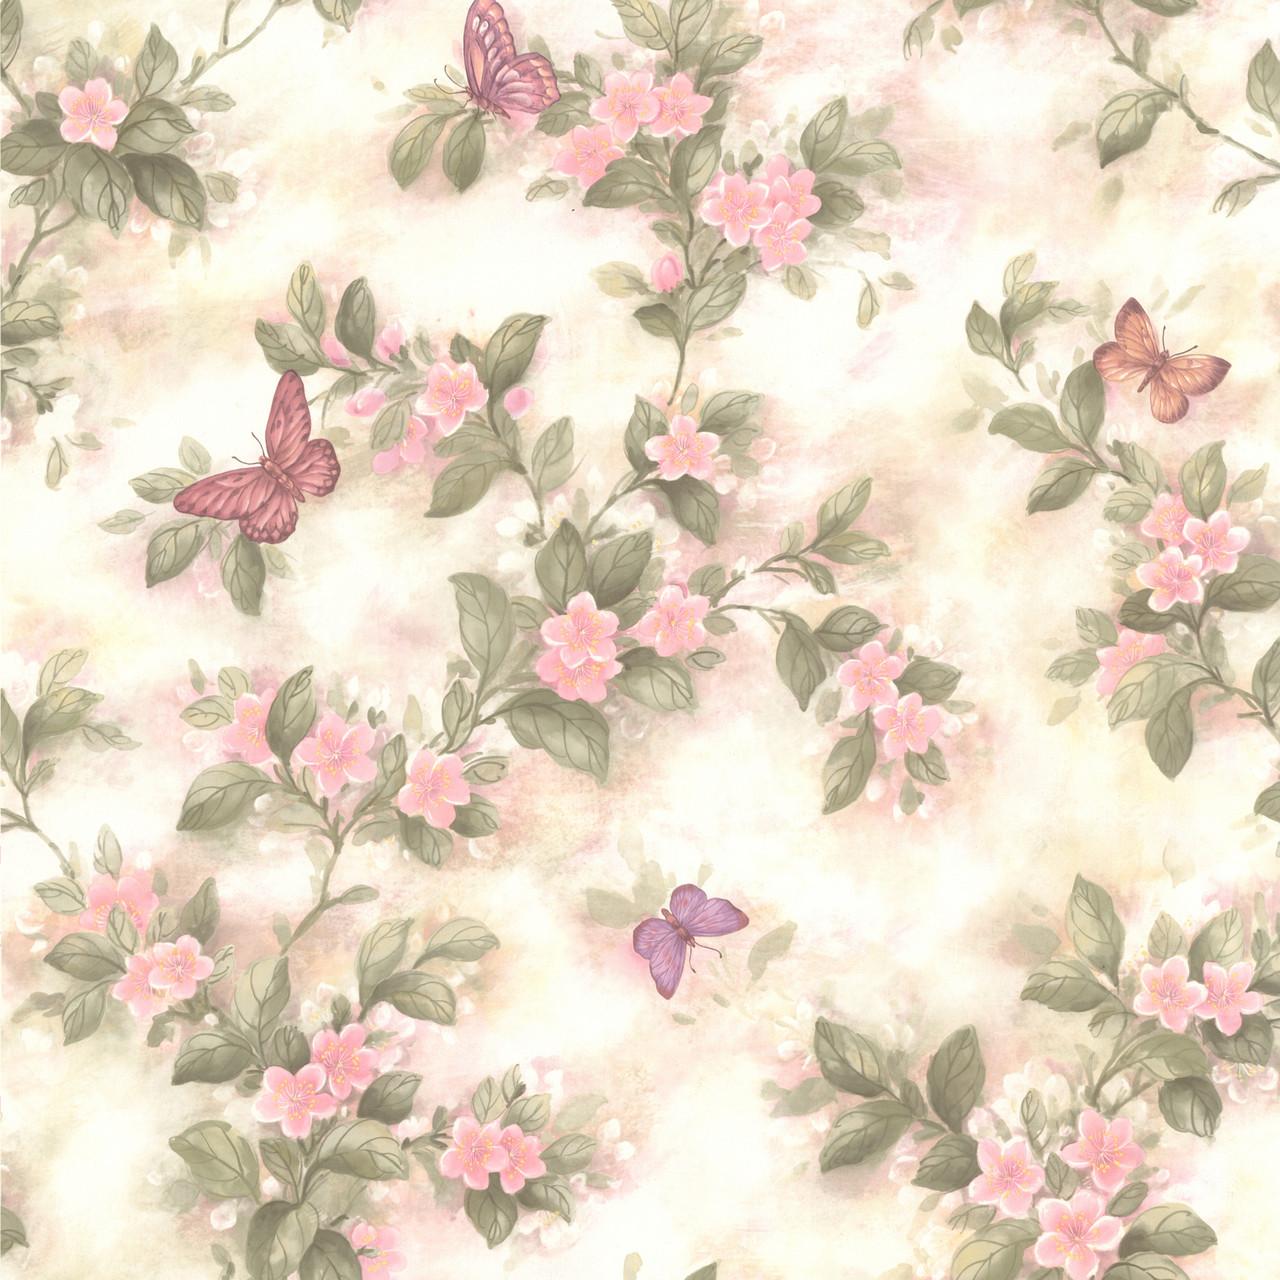 436 65763 Lisa Pink Butterfly Floral Wallpaper Indoorwallpaper Com